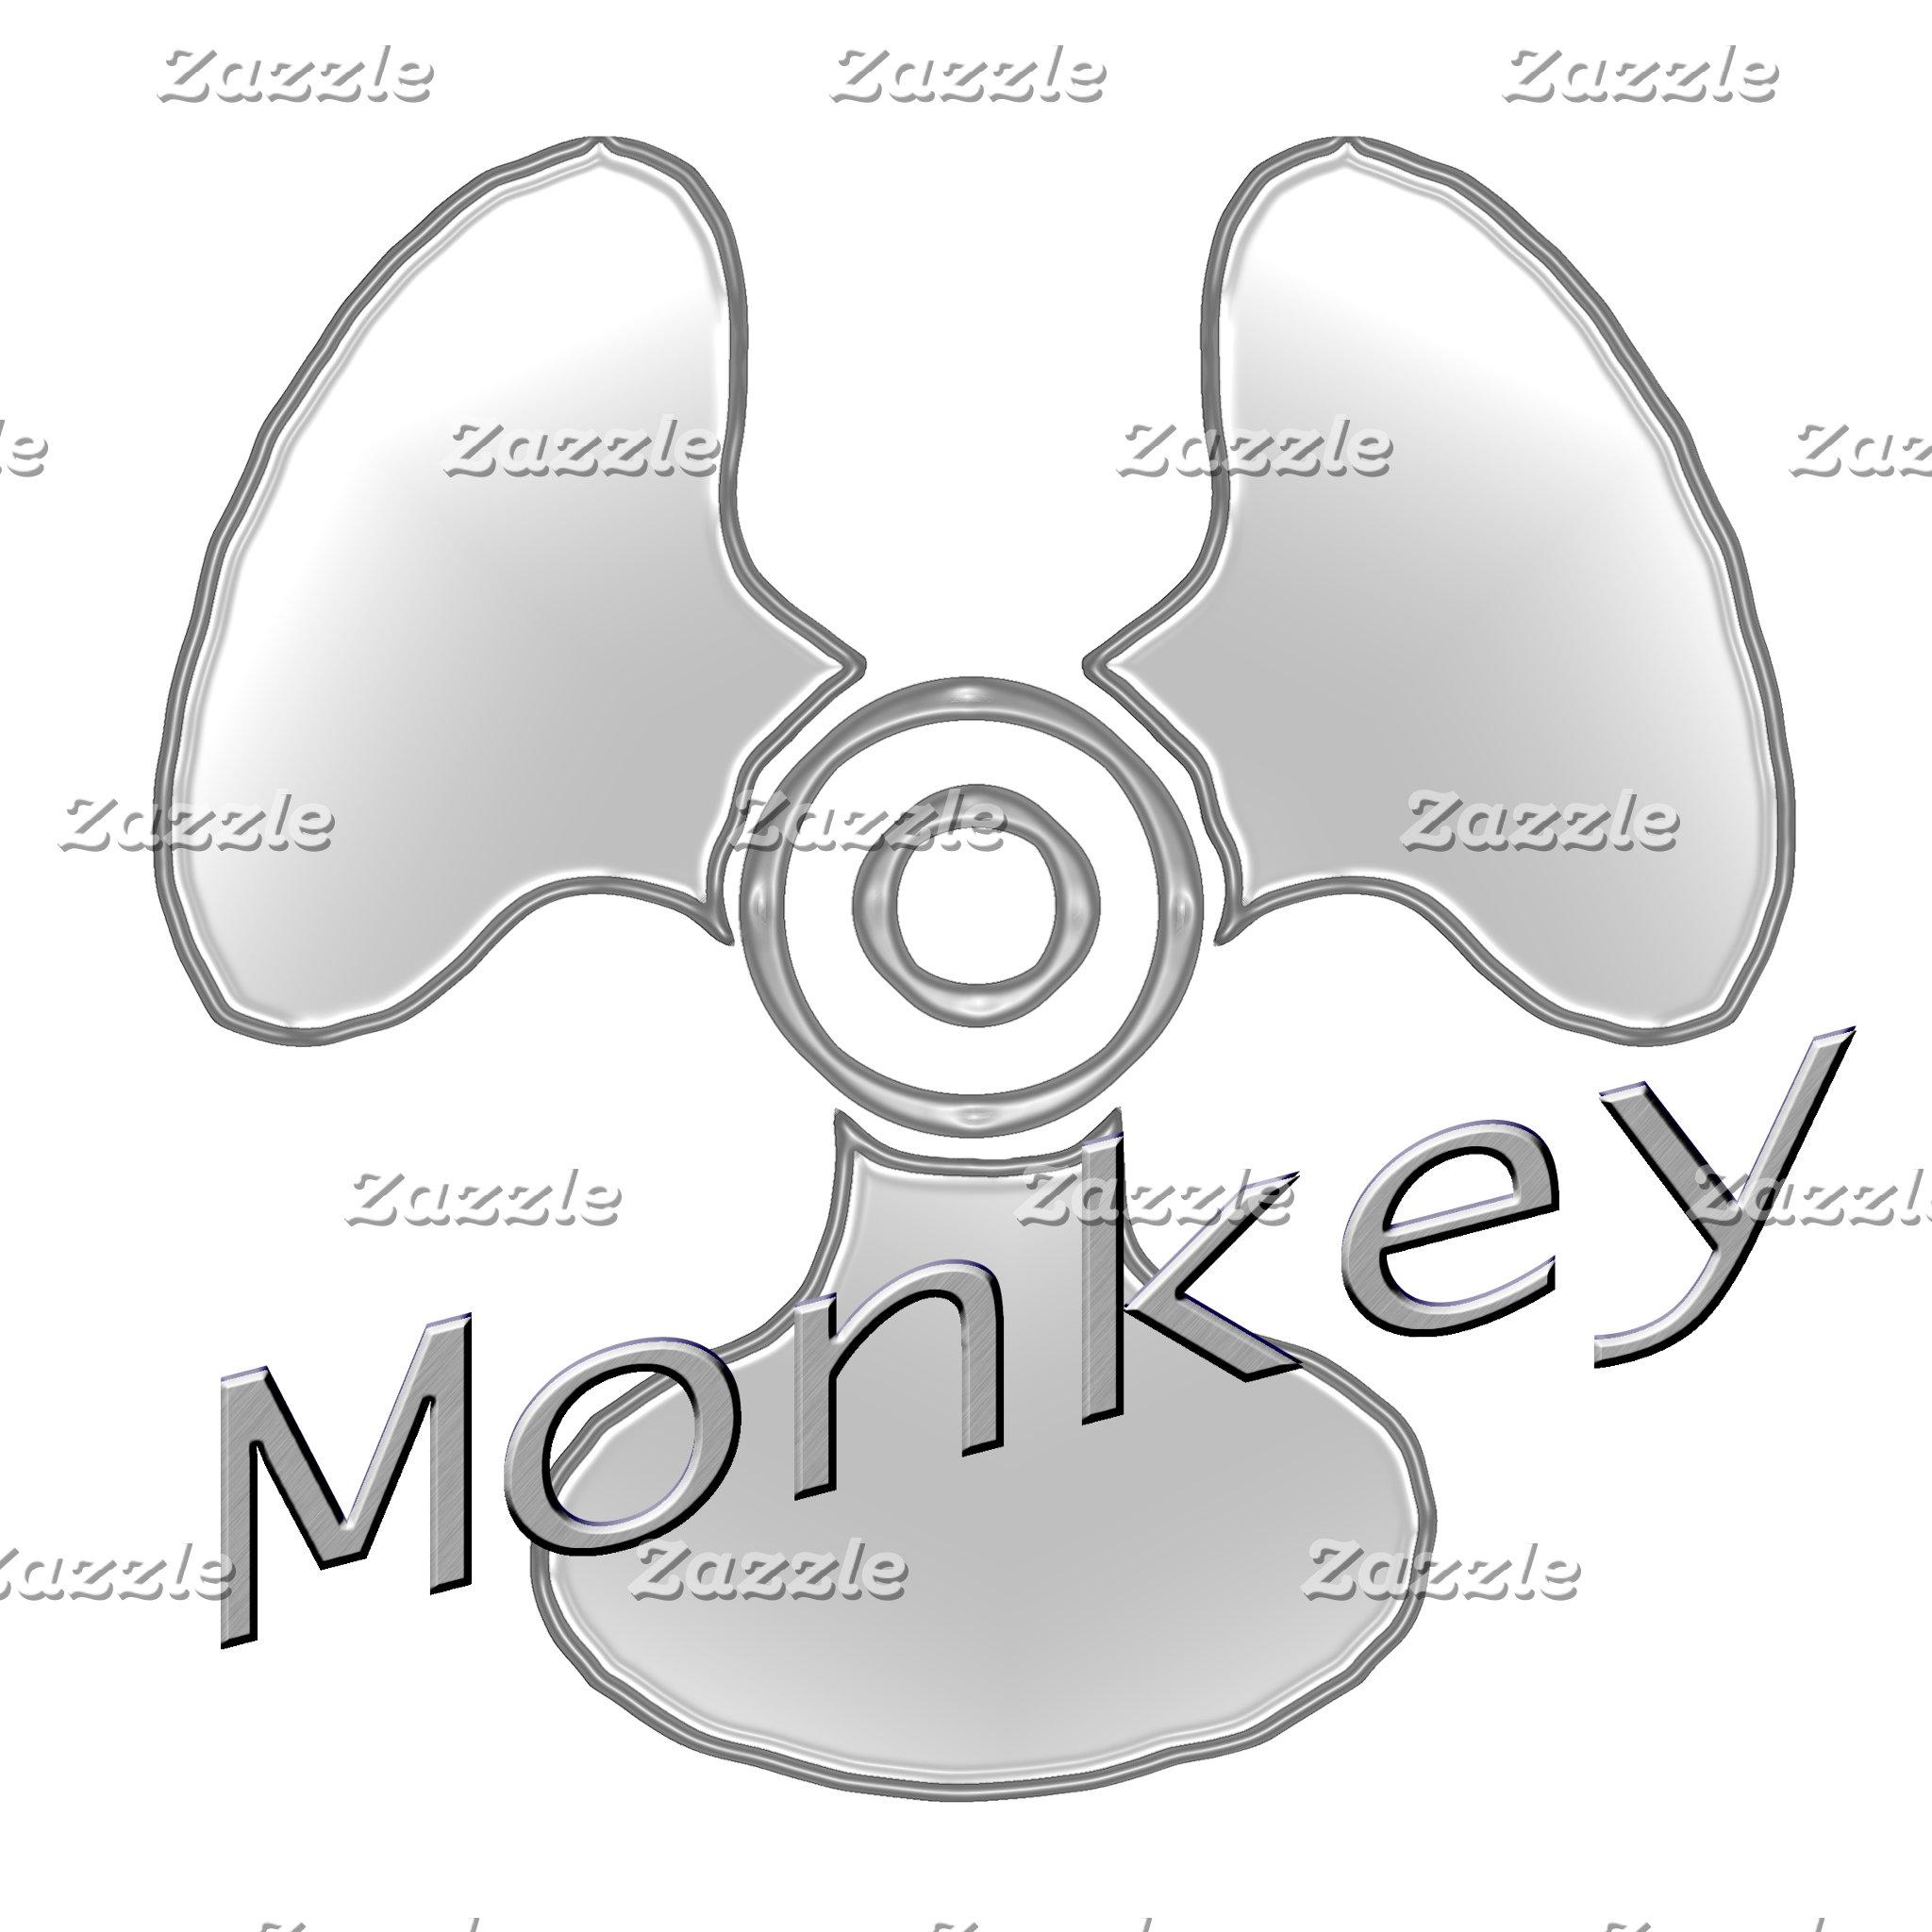 Navy Nuke Machinist's Mate, Monkey